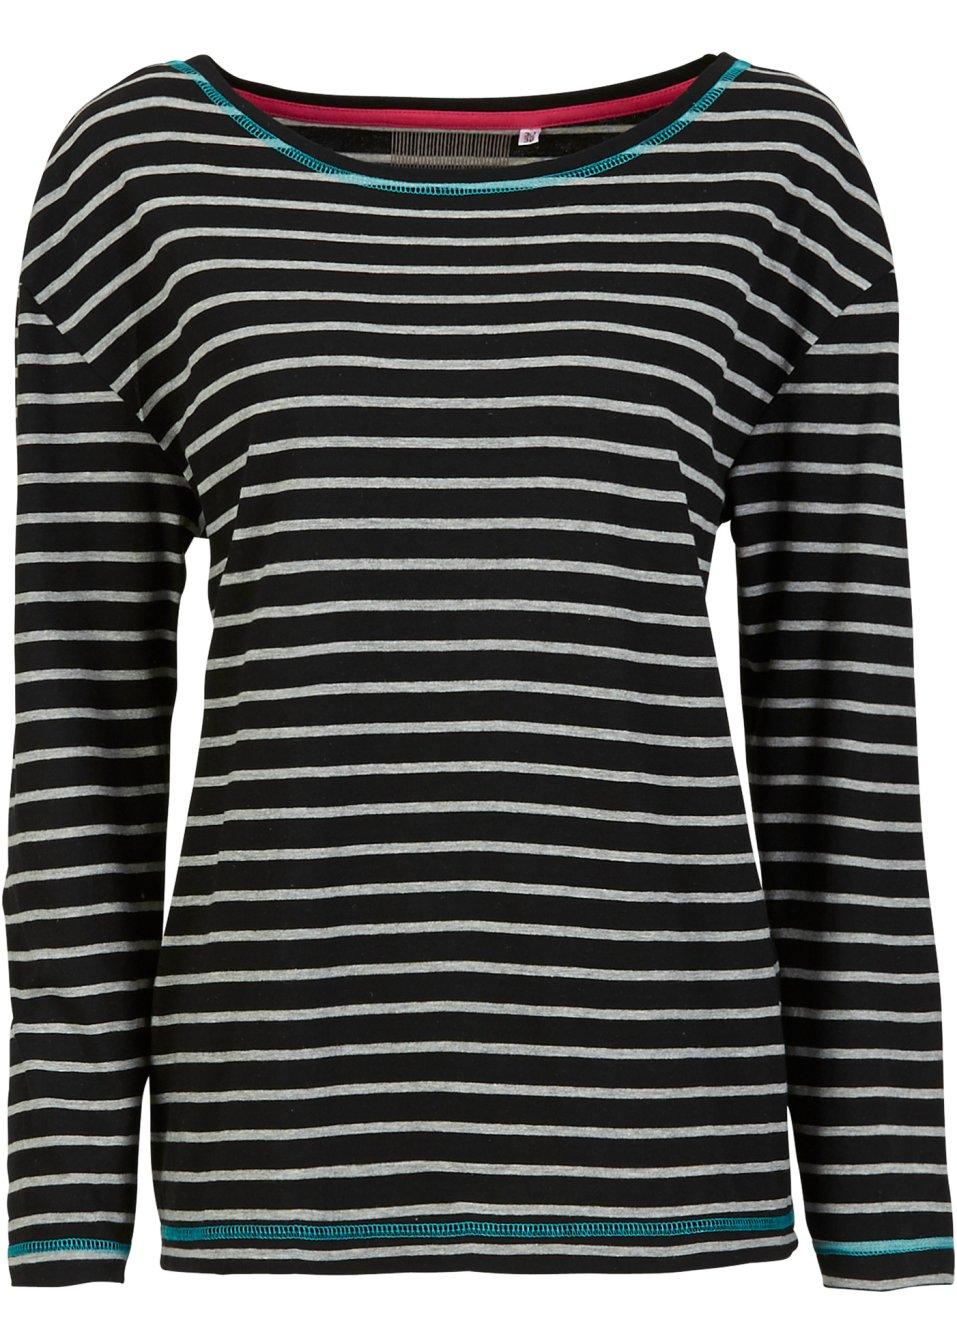 kombistarkes langarmshirt im streifendesign schwarz. Black Bedroom Furniture Sets. Home Design Ideas